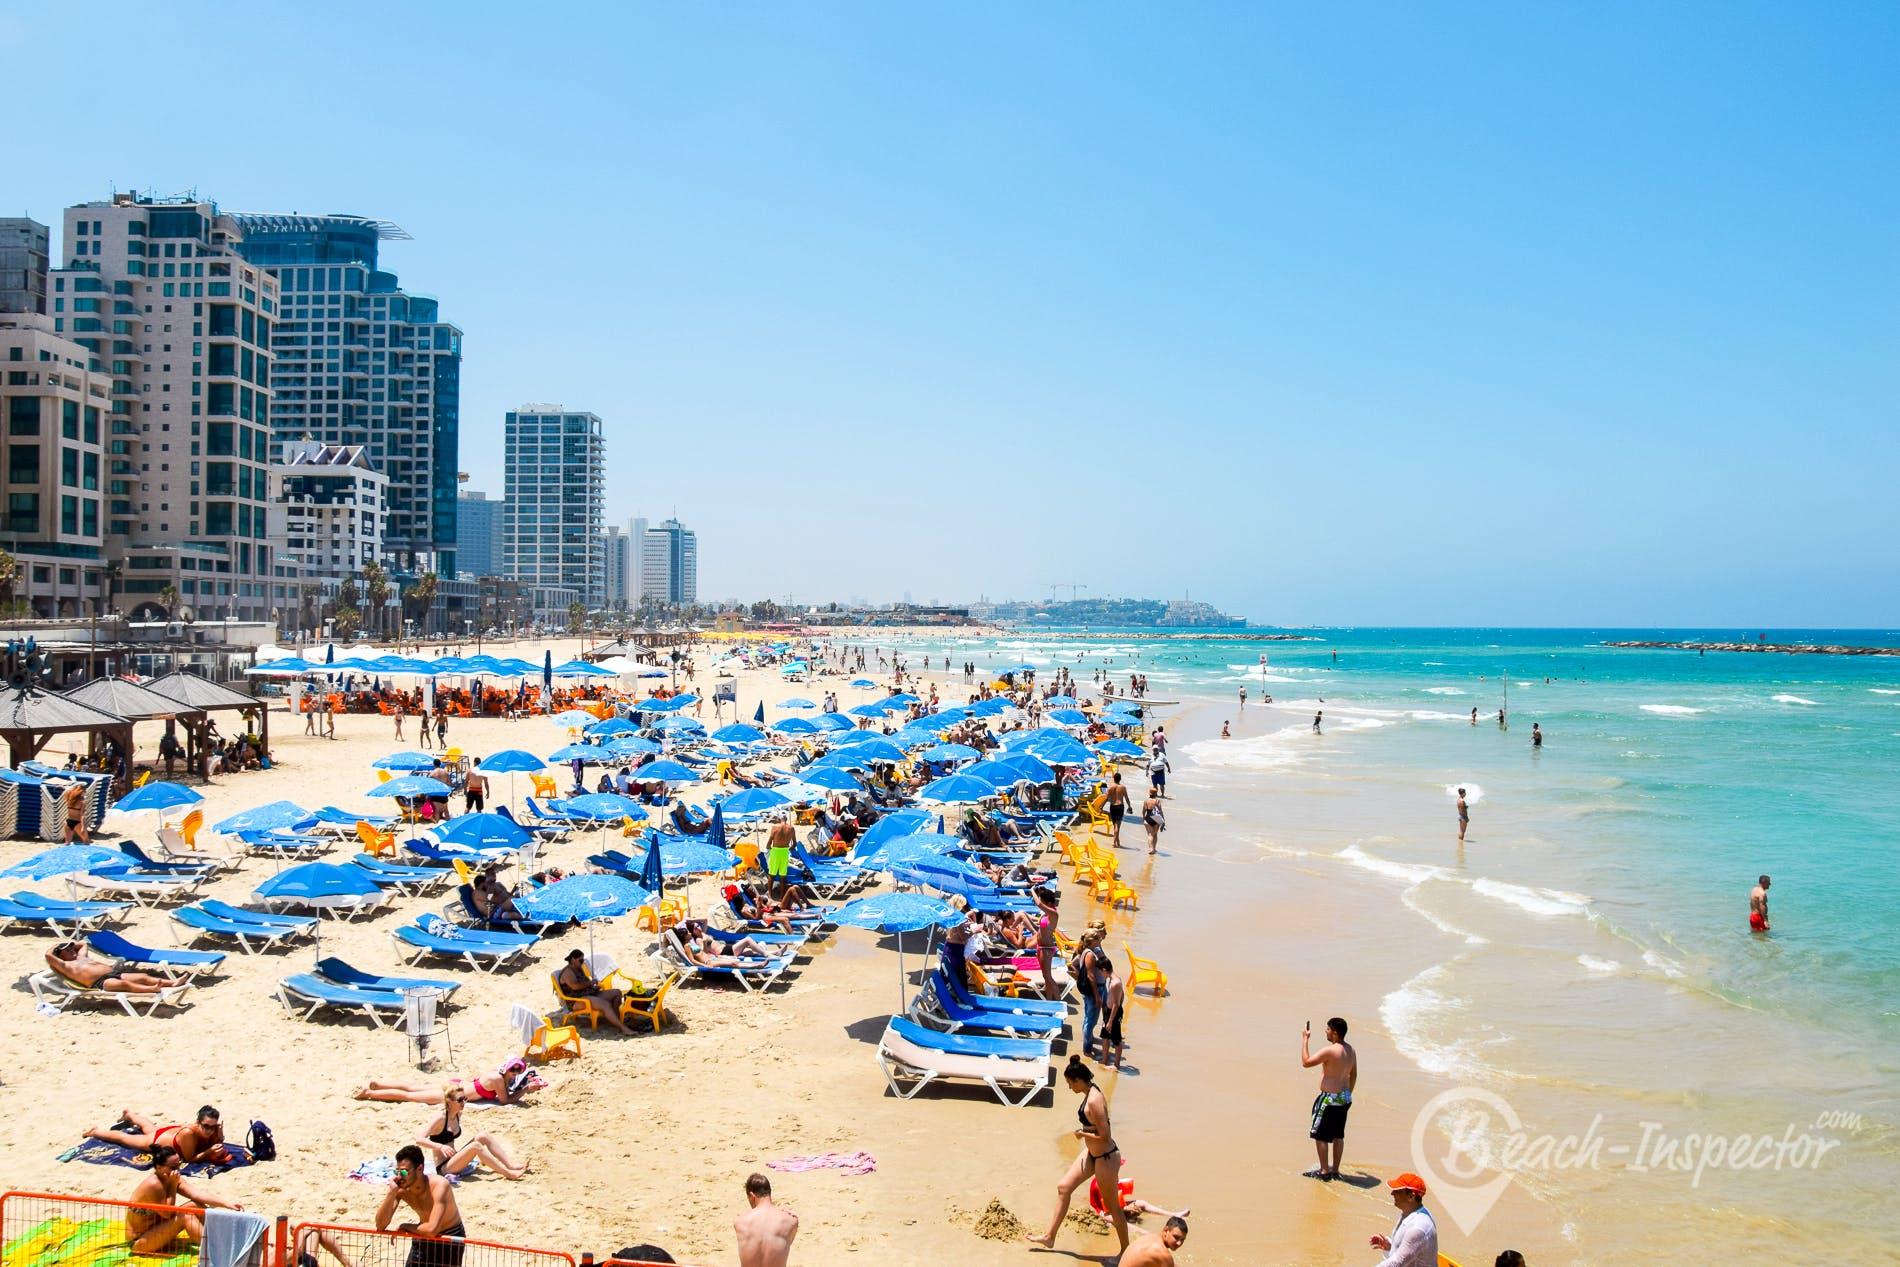 Strand Jerusalem Beach, Israel, Israel